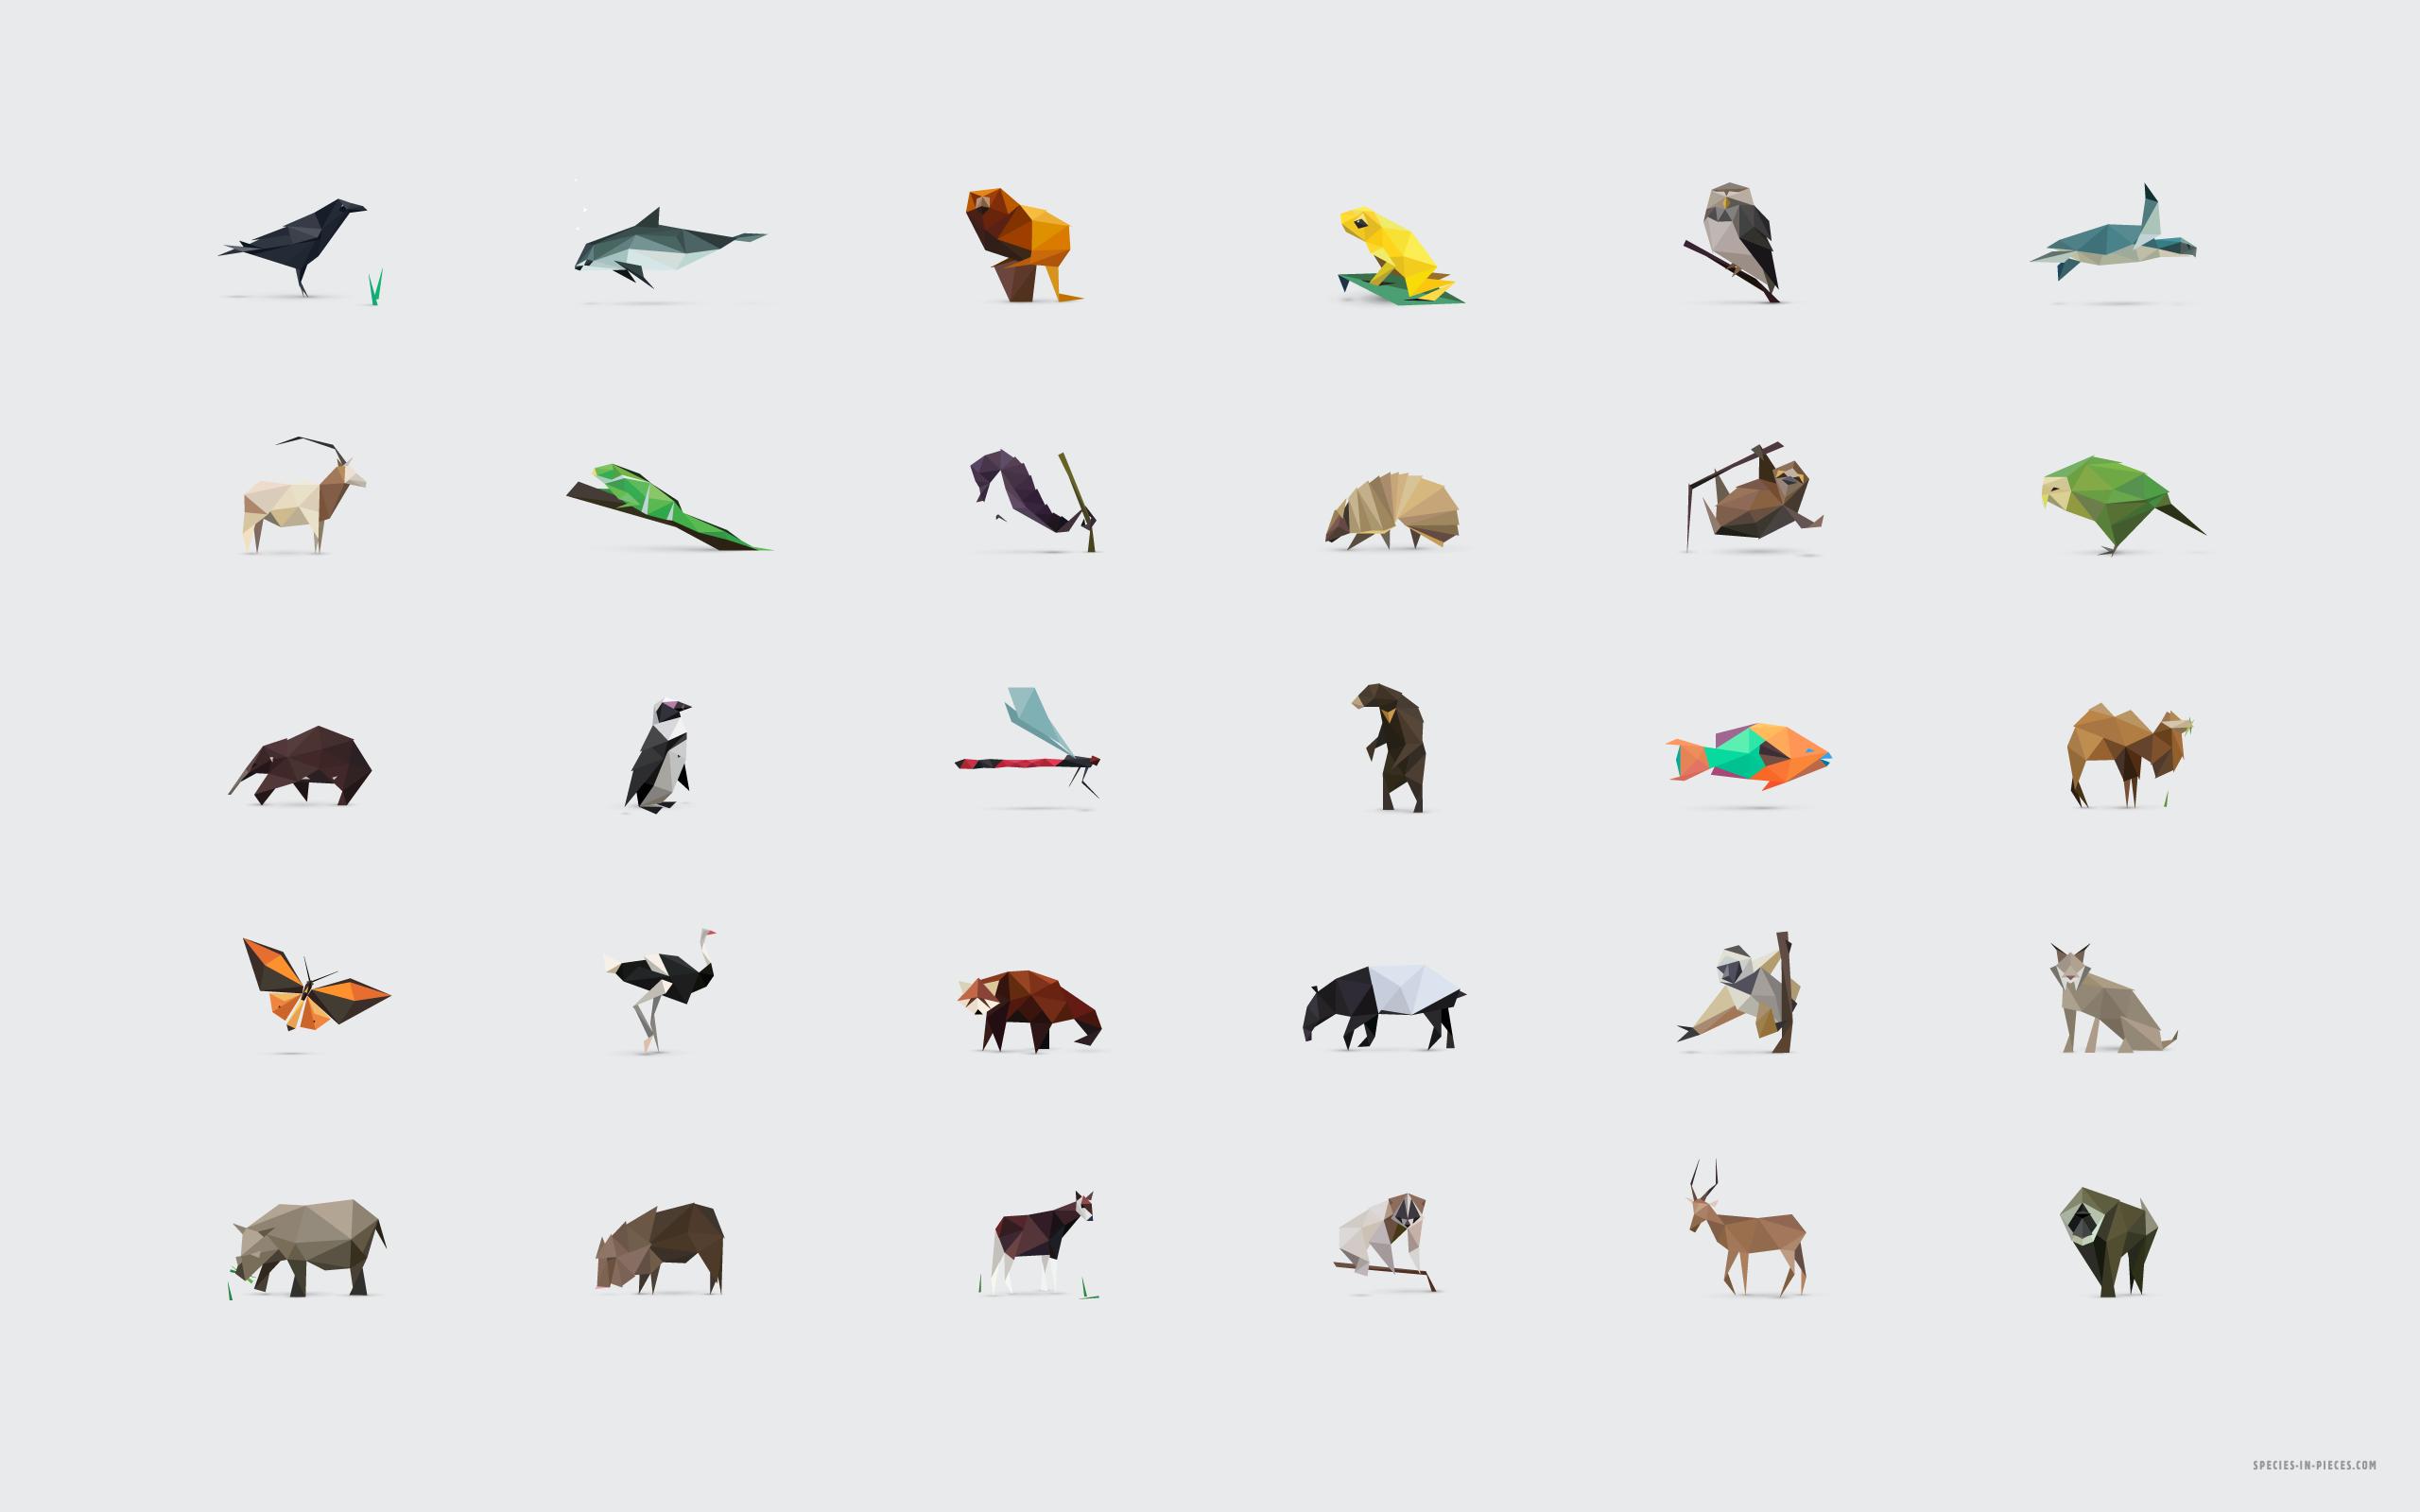 Geometric Animal Wallpaper 74 Images: Drawing Animal Geometric Shapes